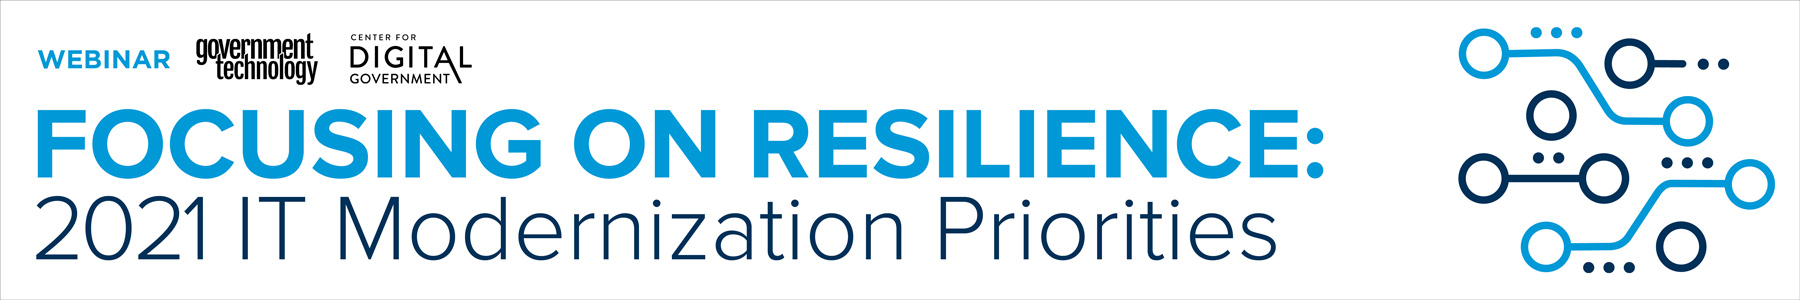 Focusing on Resilience: 2021 IT Modernization Priorities